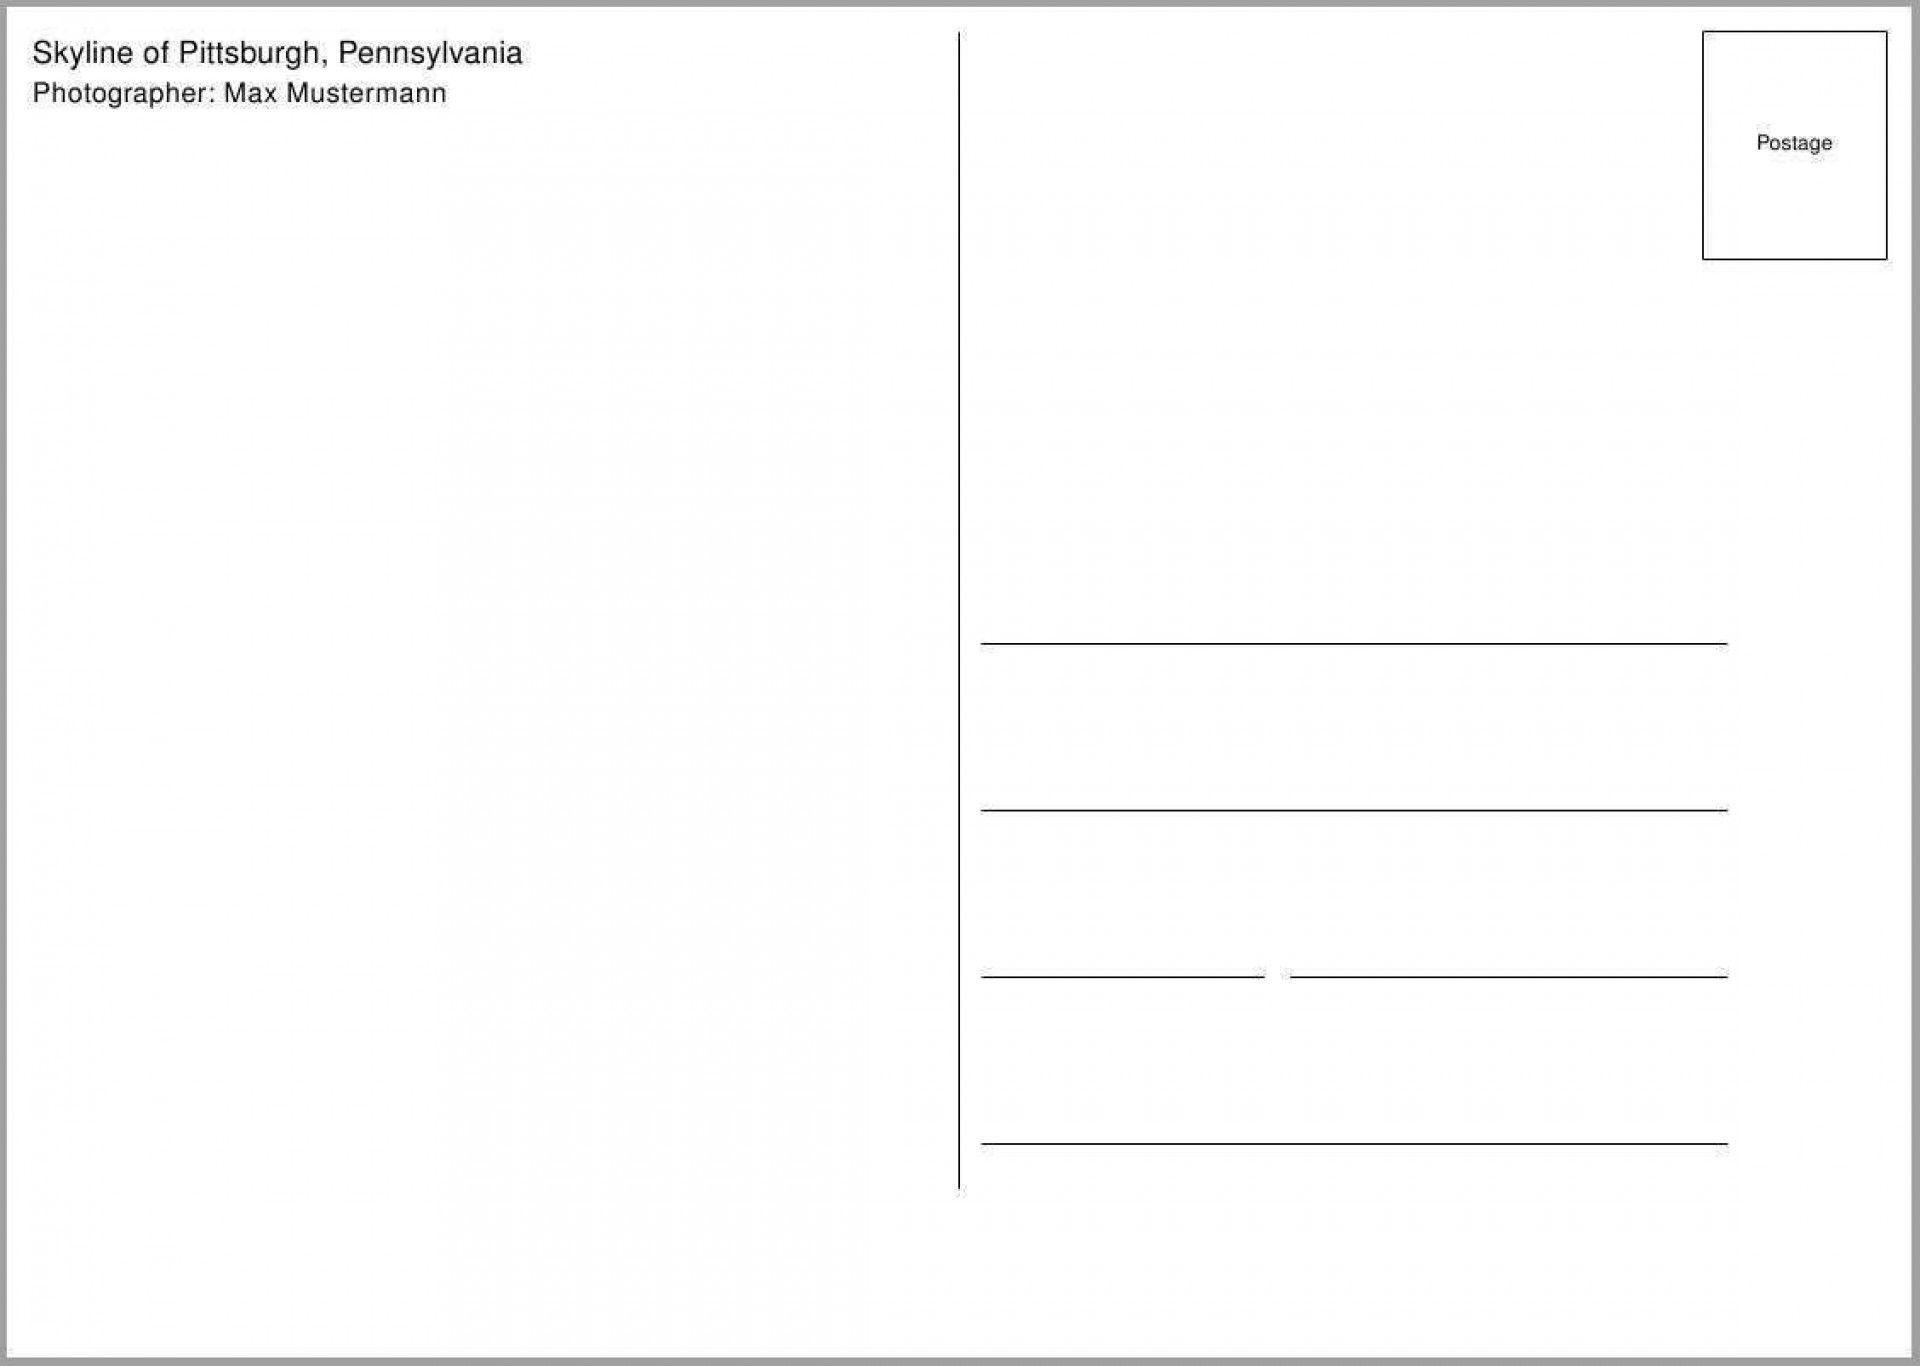 008 Wonderful 5 X 7 Postcard Template Microsoft Word Image Full